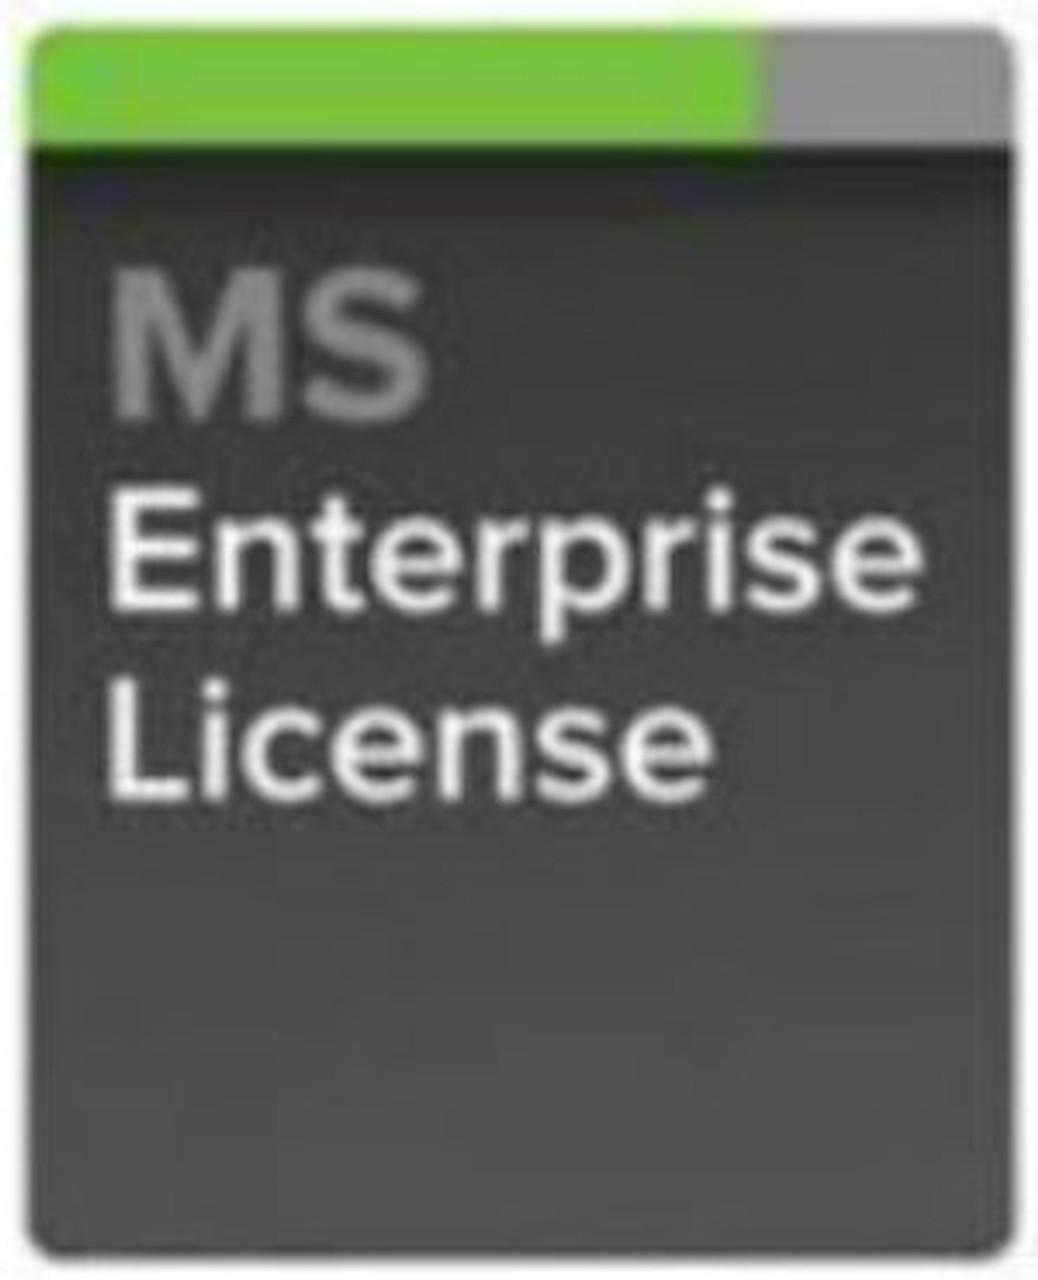 LIC-MS350-24-1YR Enterprise Meraki License for MS350-24 1 Year